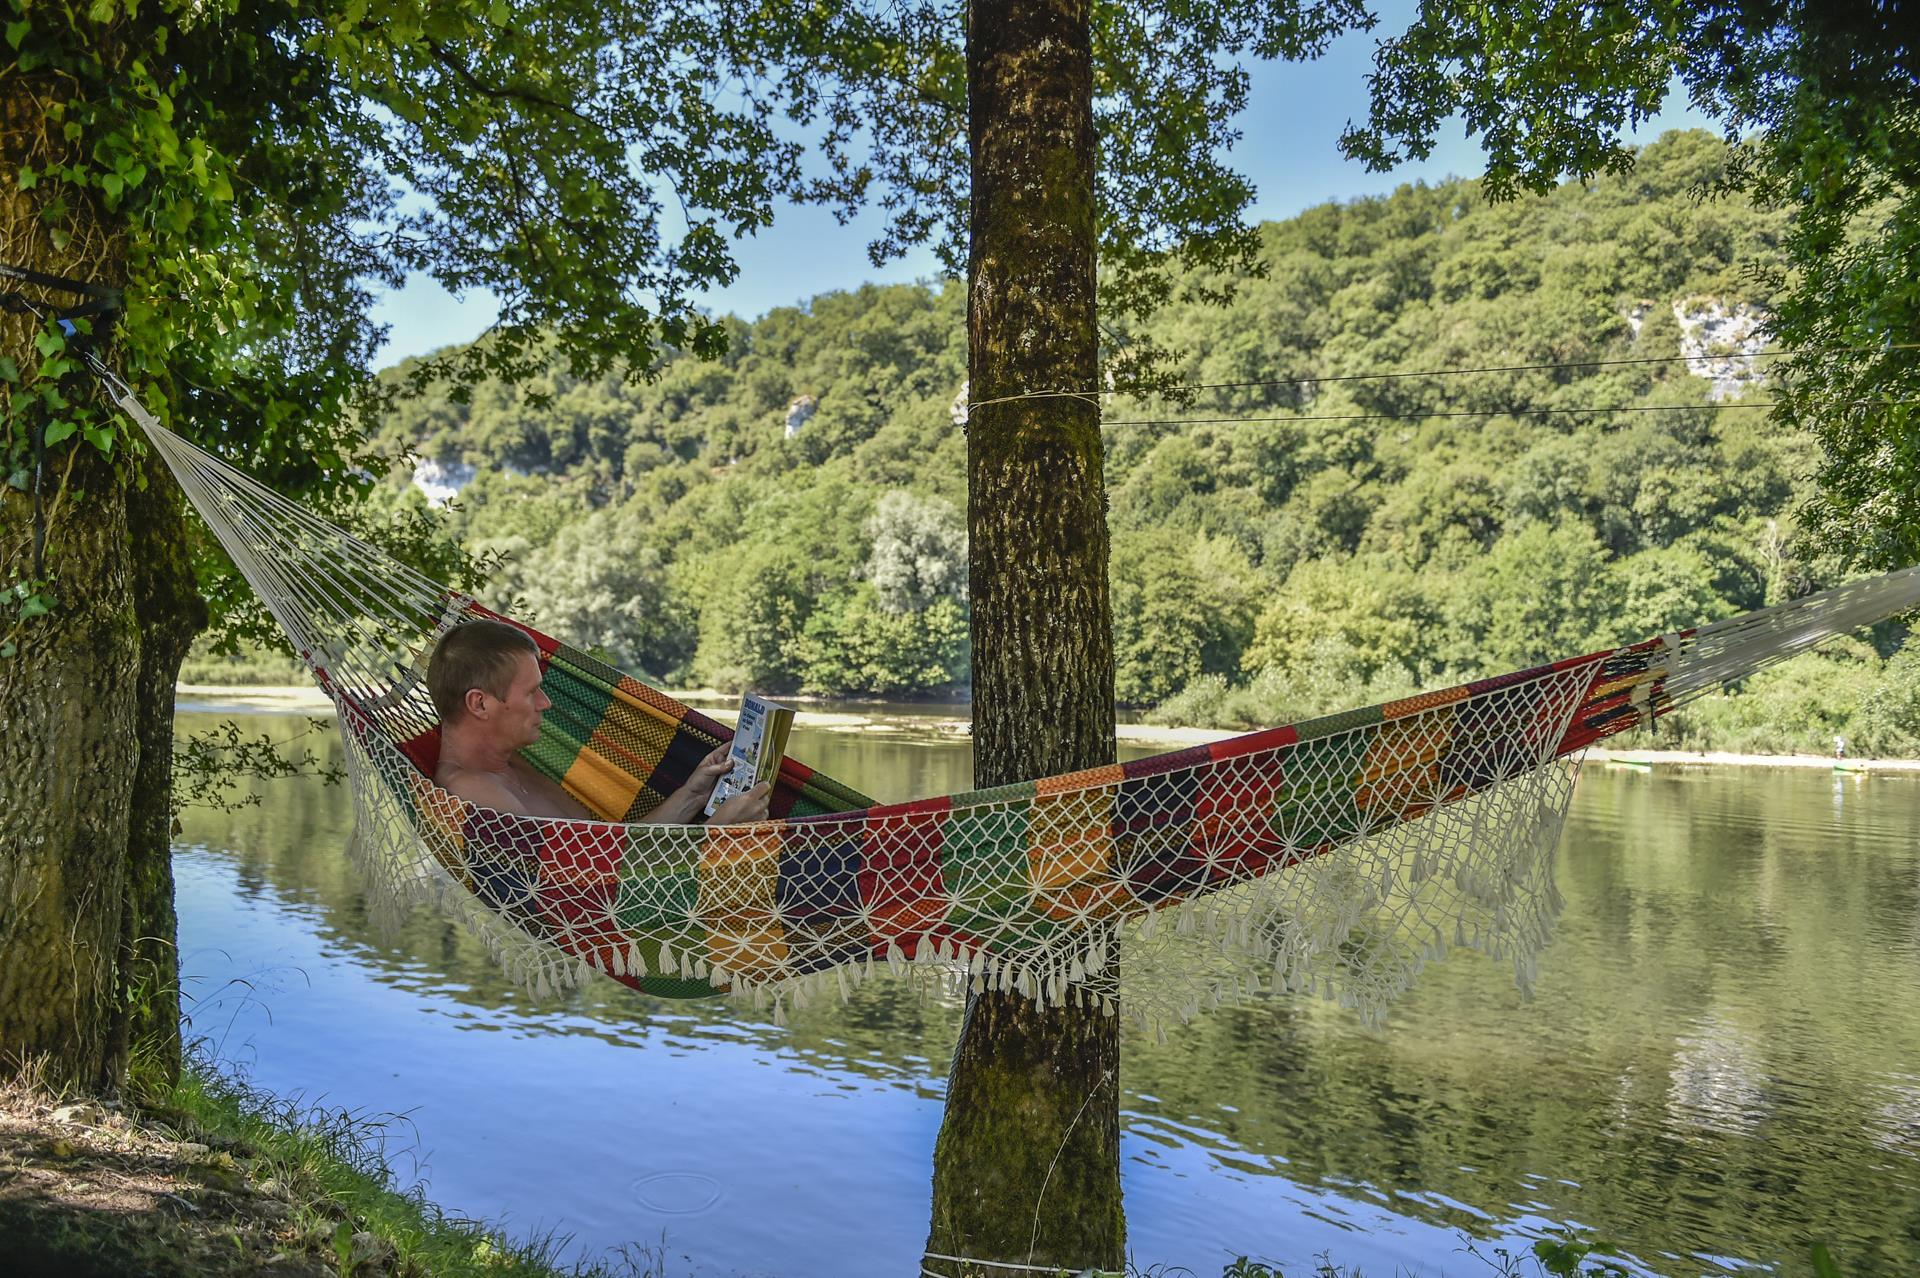 Camping la Riviere, Lacave, Lot